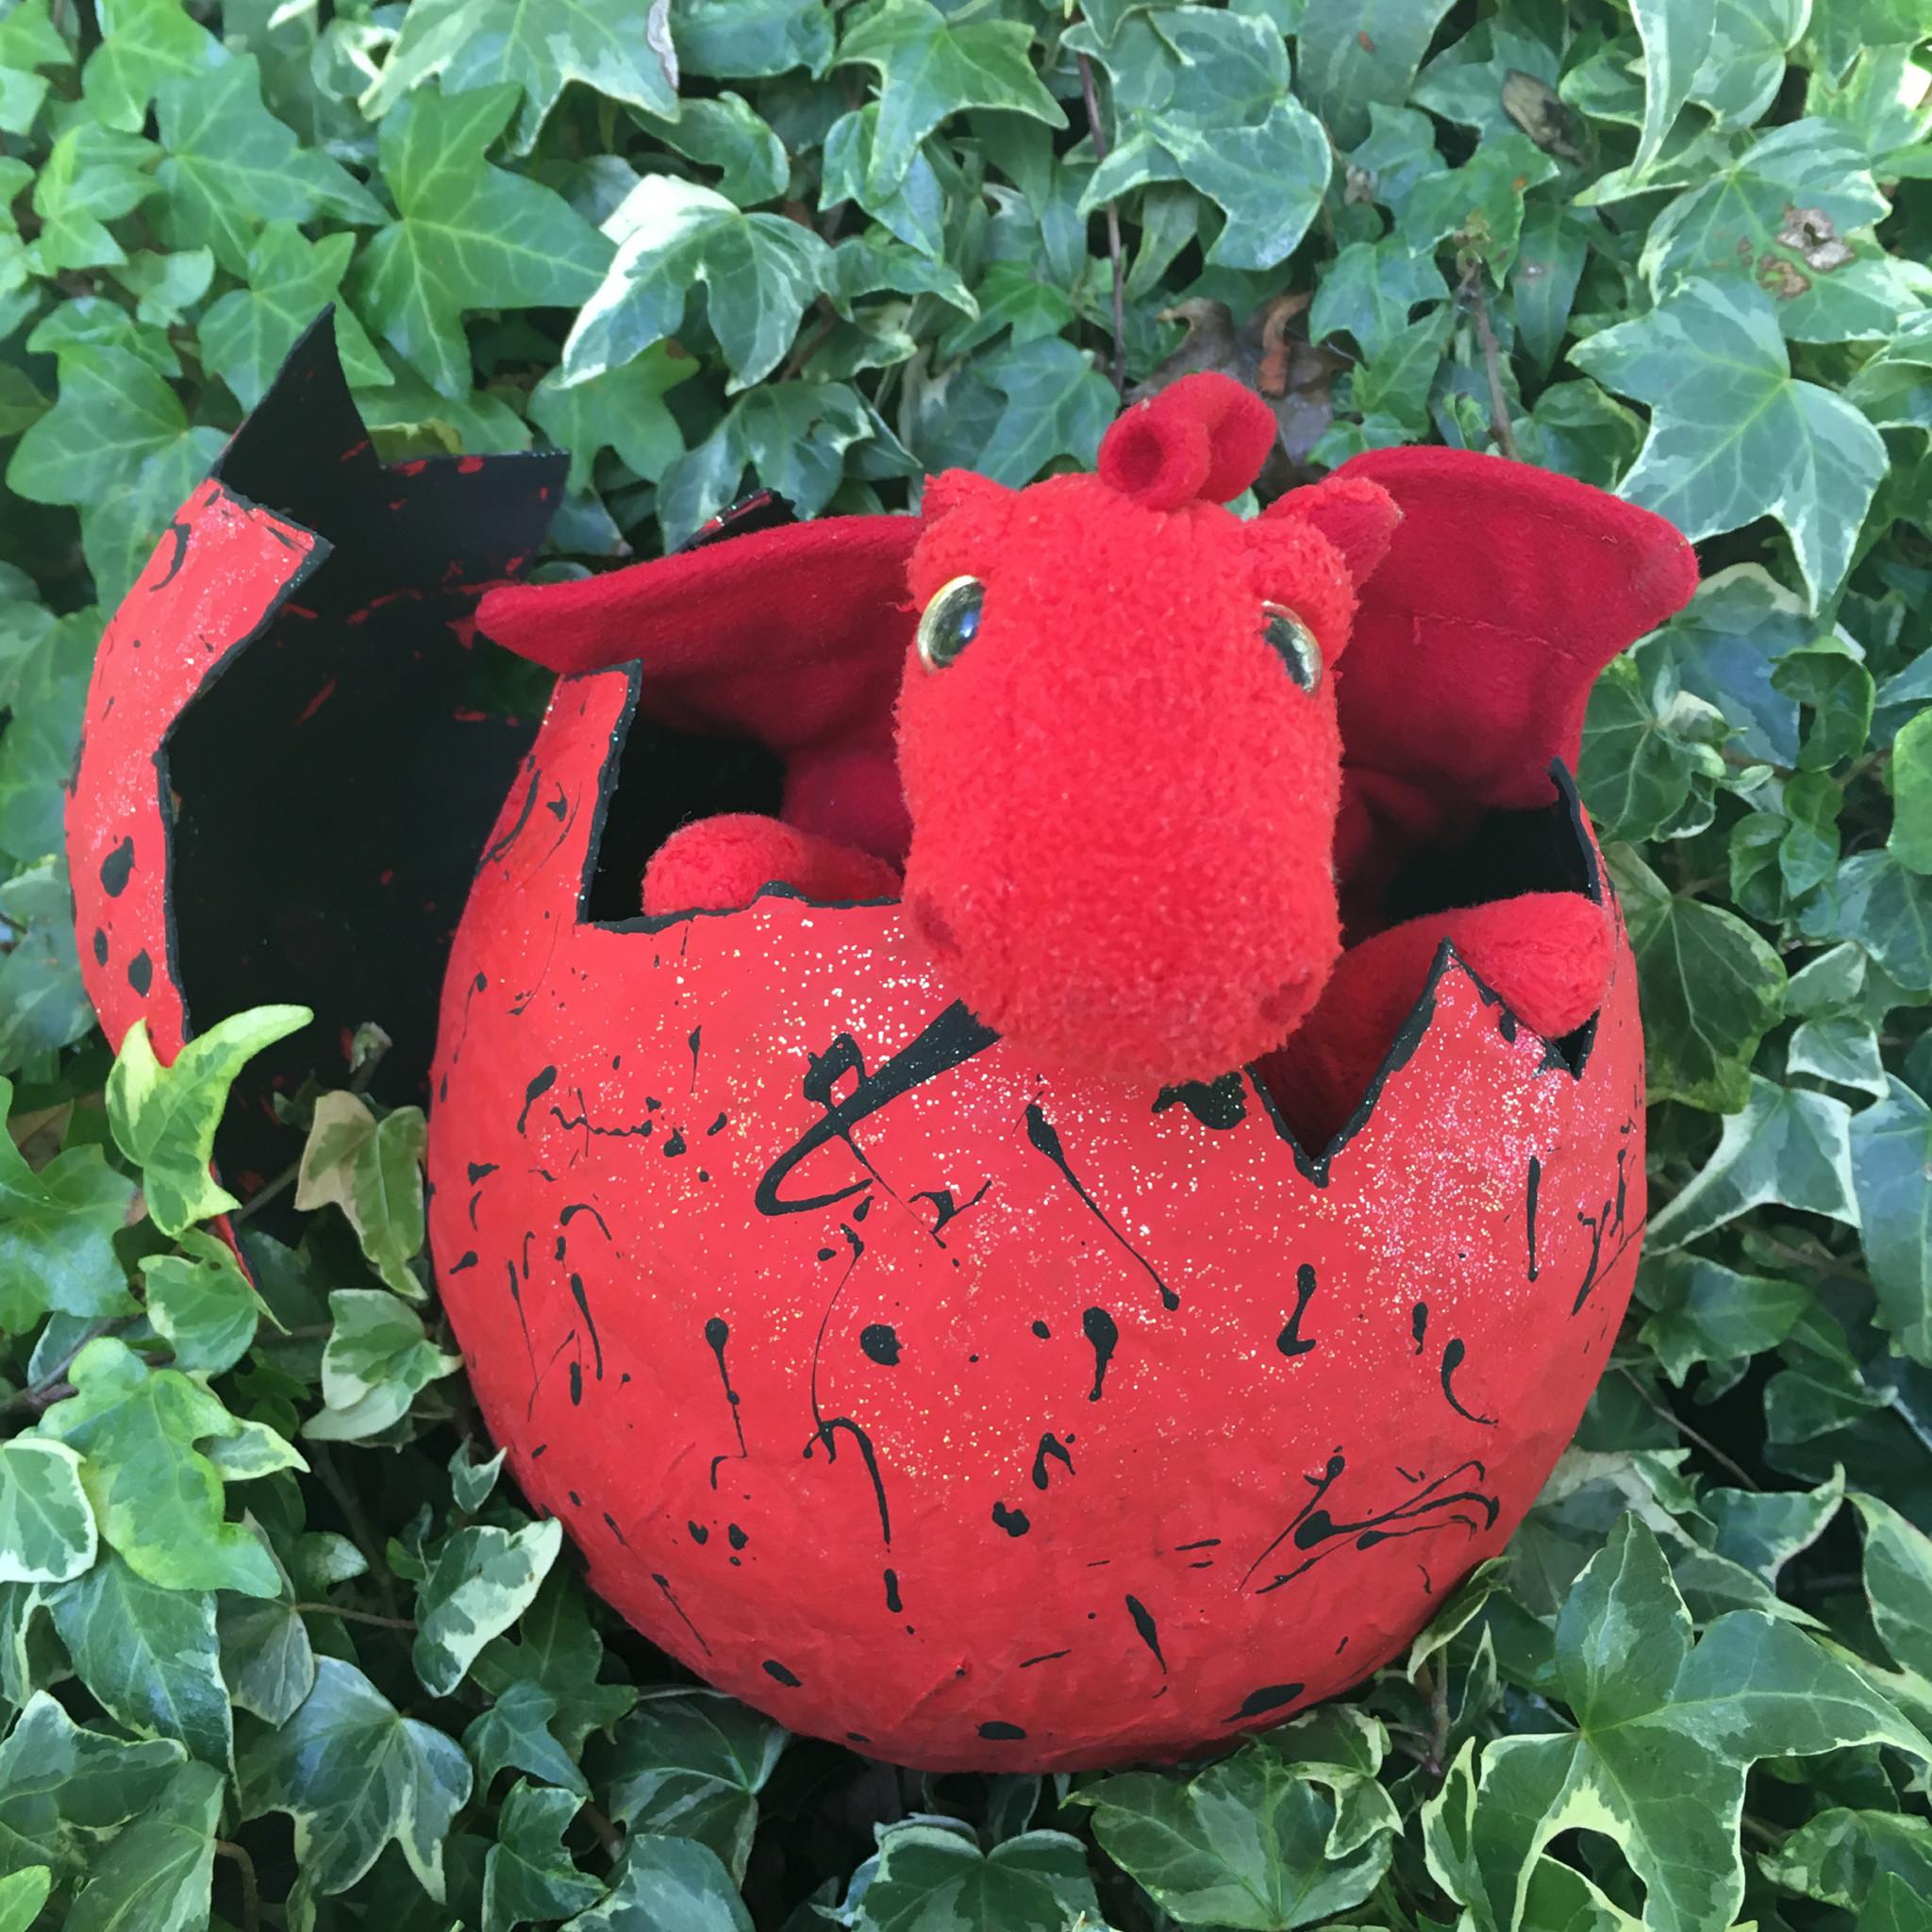 papier mache egg - dragon